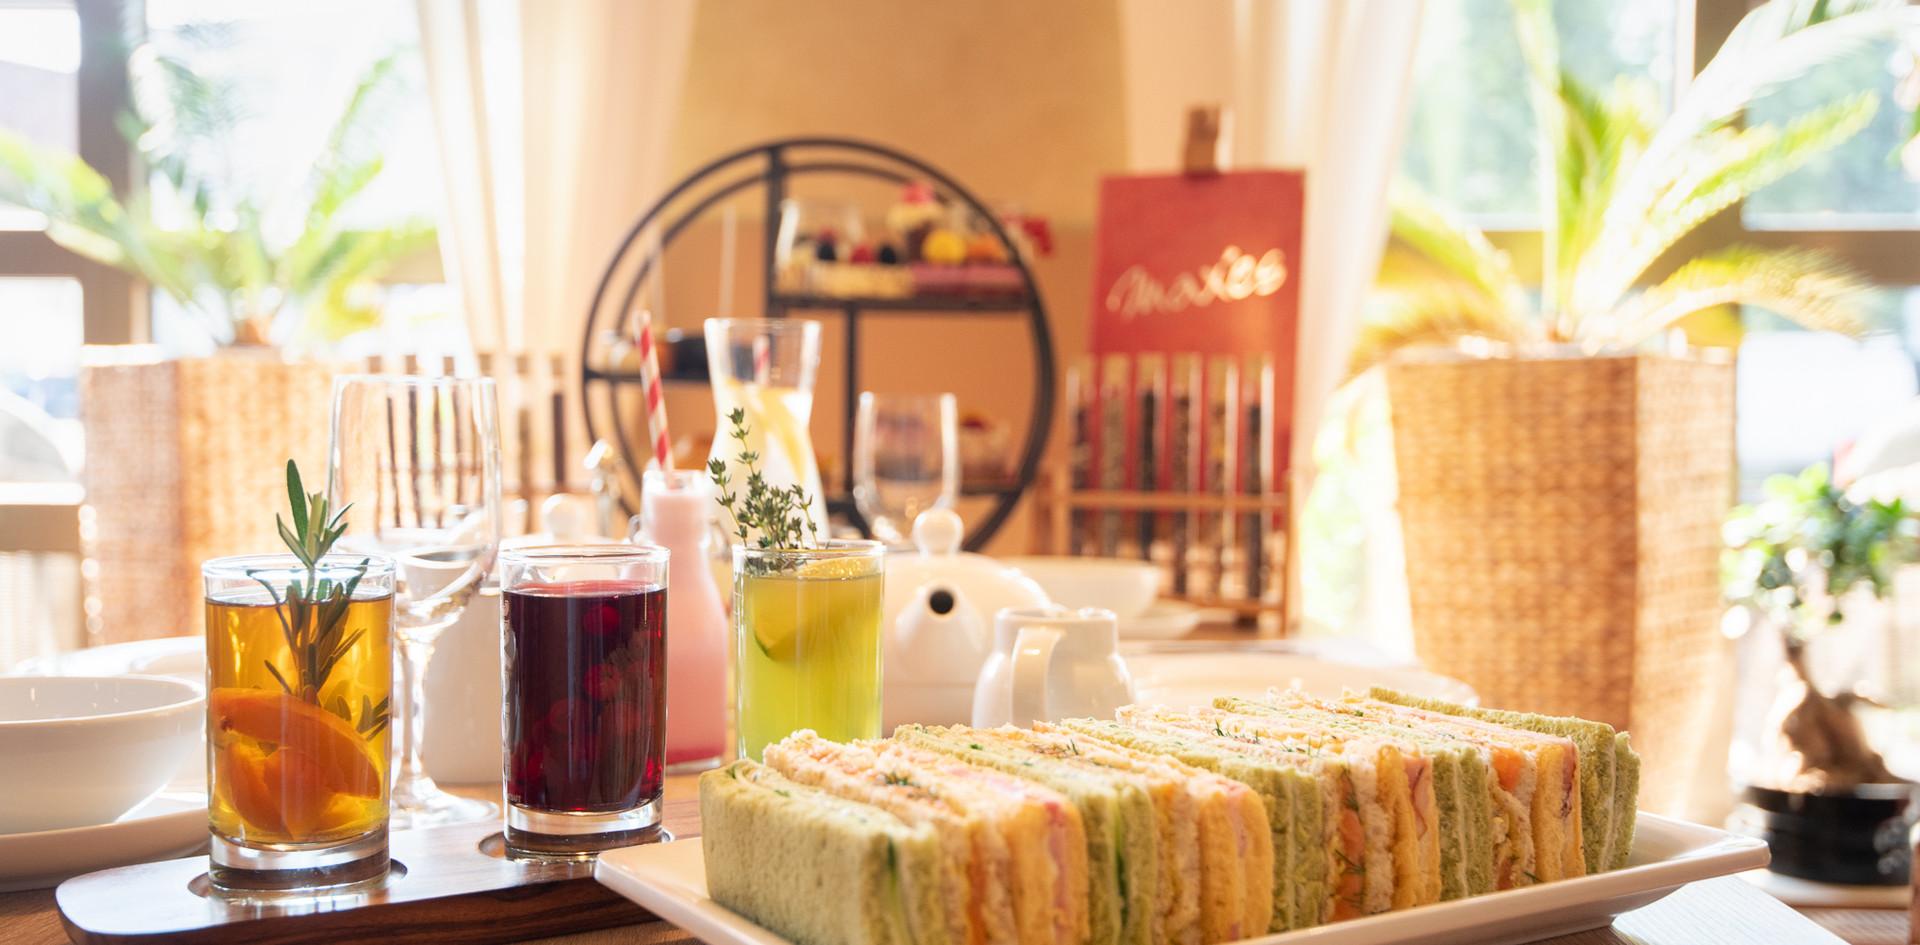 Sandwiches Afternoon Tea - Hotel Wegner - The culinary Art Hotel